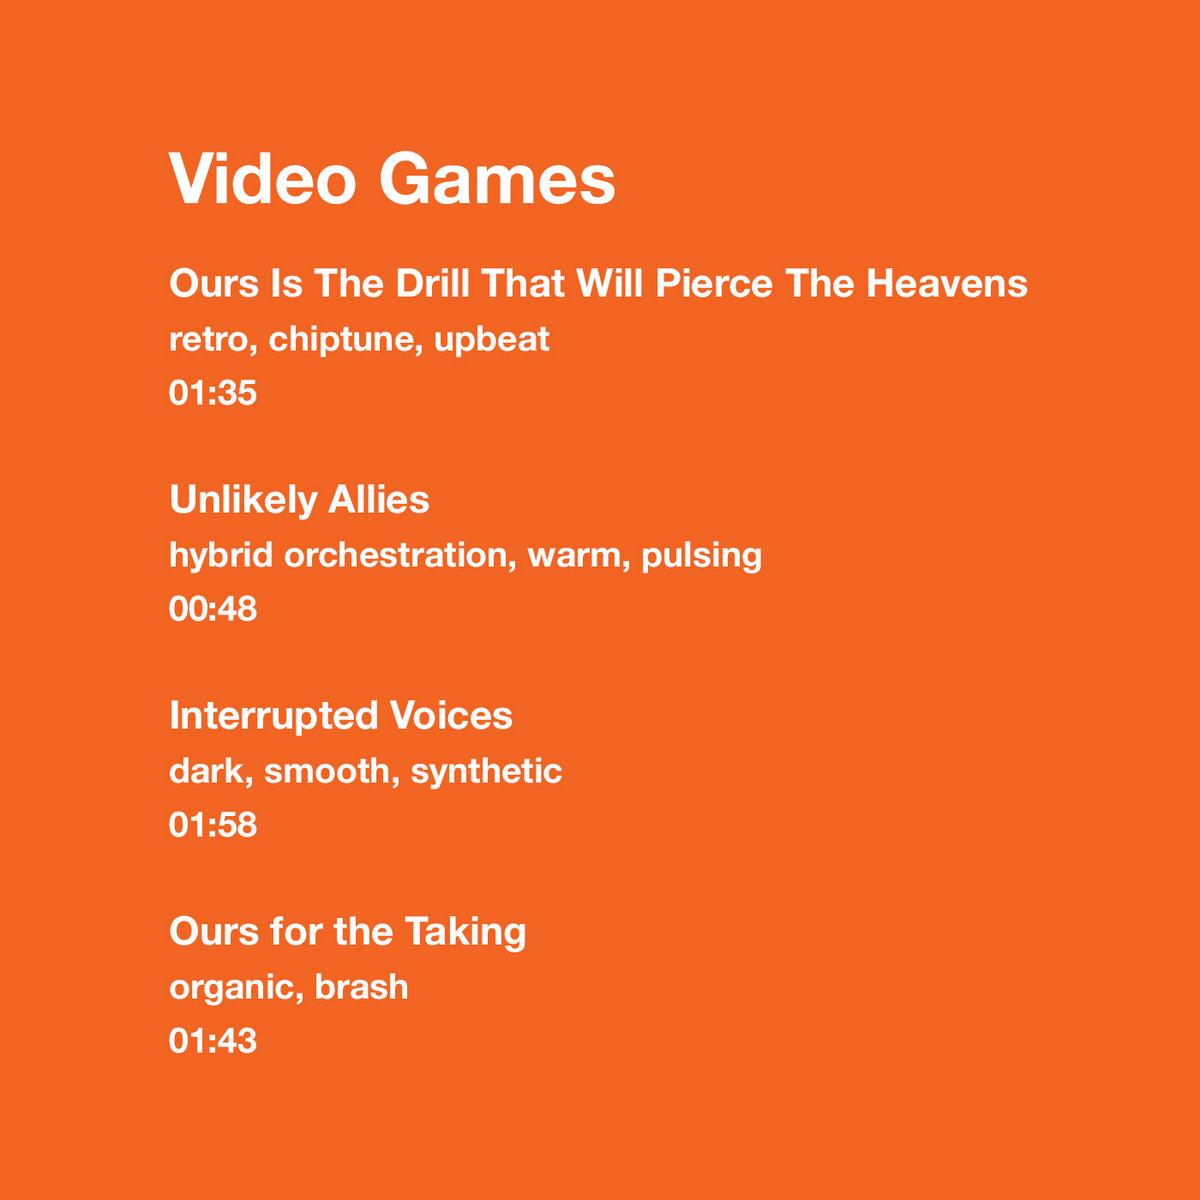 Video Games | Stephen Tanksley